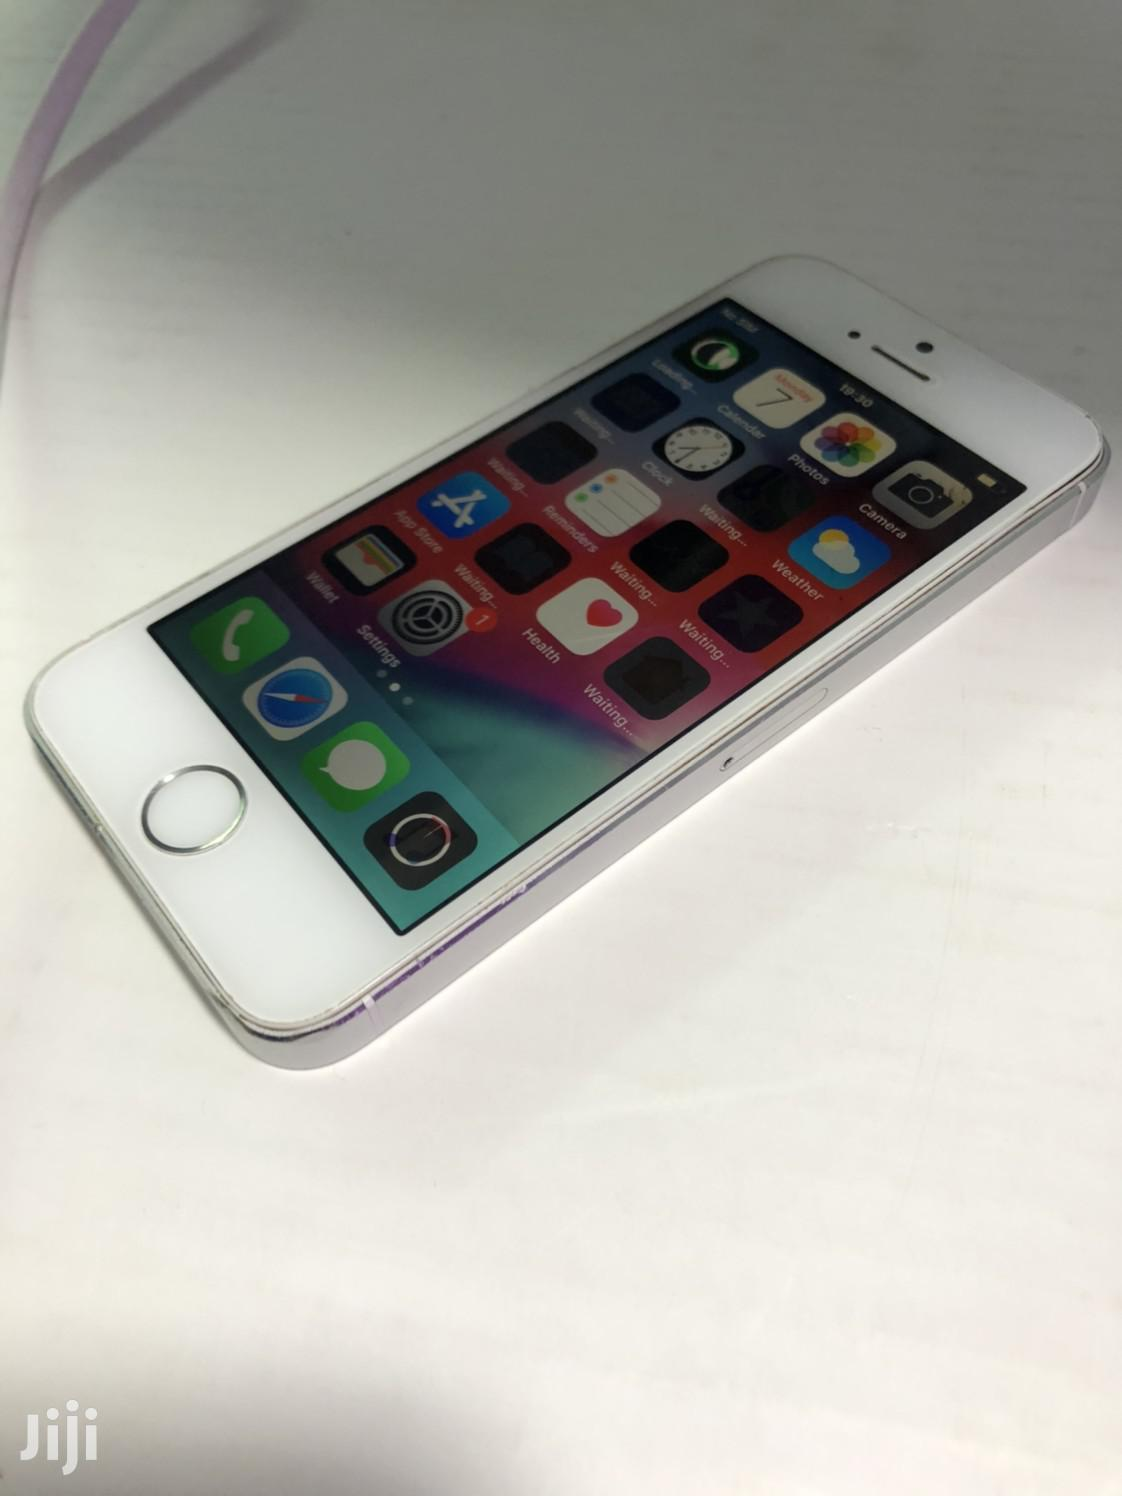 Apple iPhone 5s 16 GB Silver | Mobile Phones for sale in Nairobi Central, Nairobi, Kenya